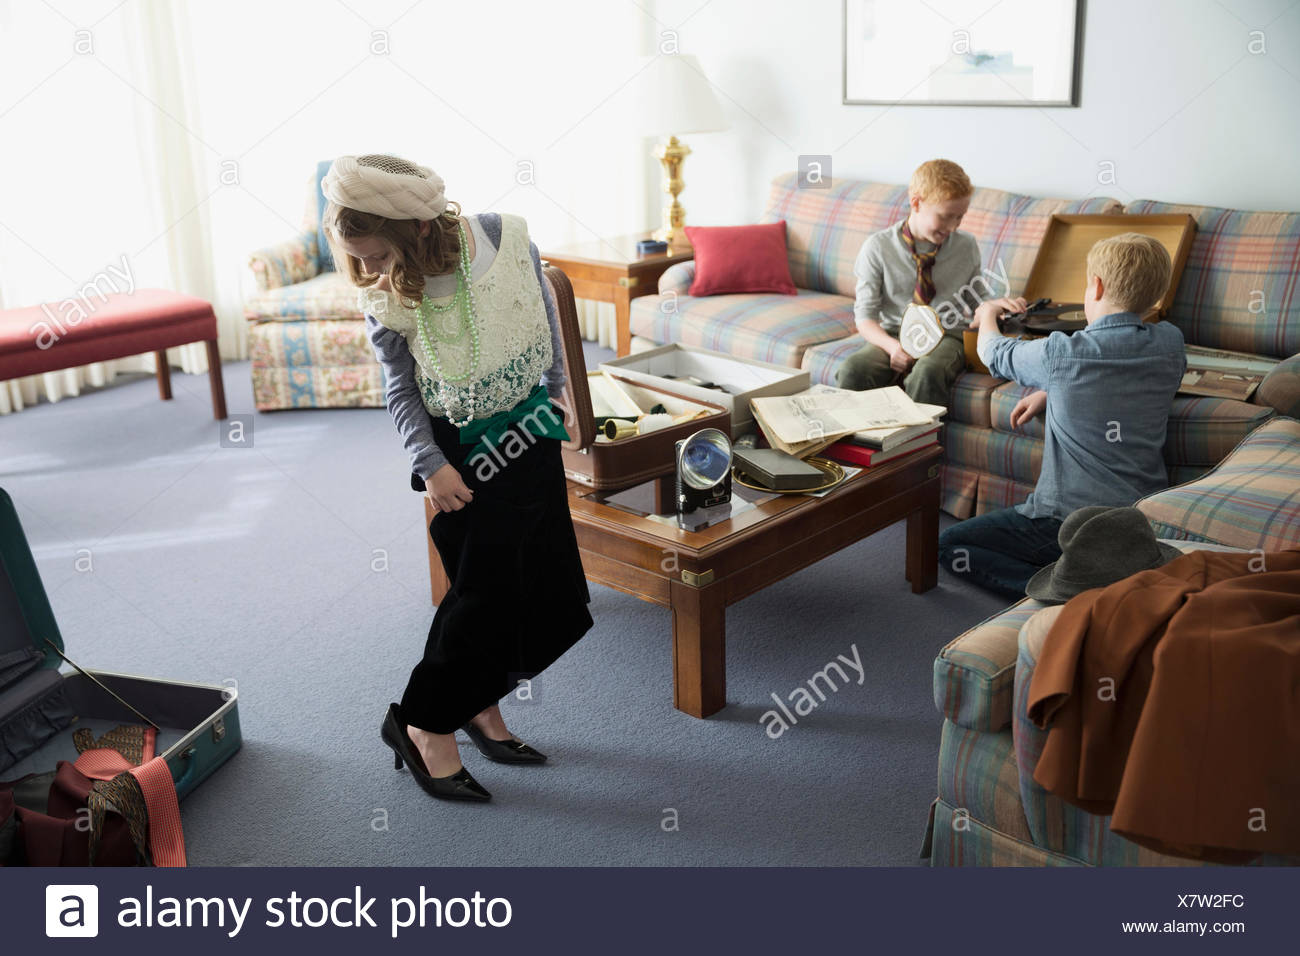 Girl wearing old-fashioned clothing - Stock Image